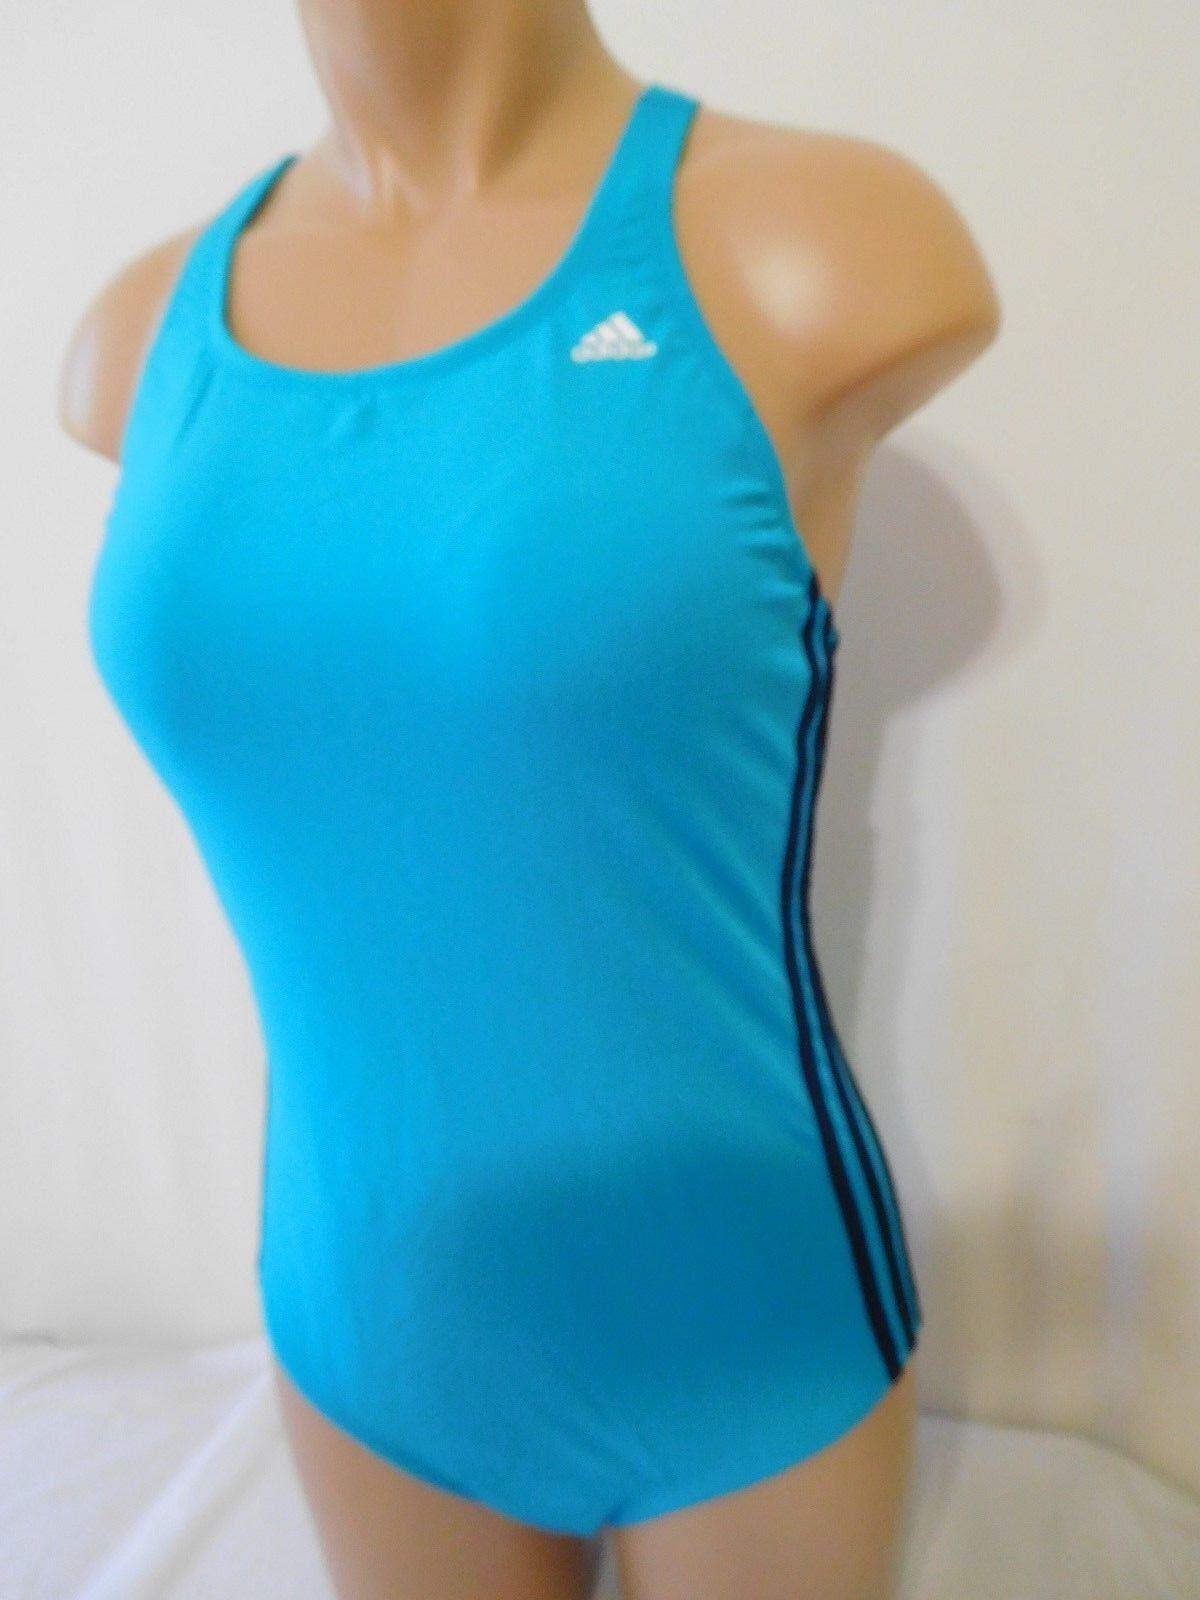 Adidas Size Swimsuit Bathing Suit Women Shock Mint Size Adidas 14 New One Peice e3f444